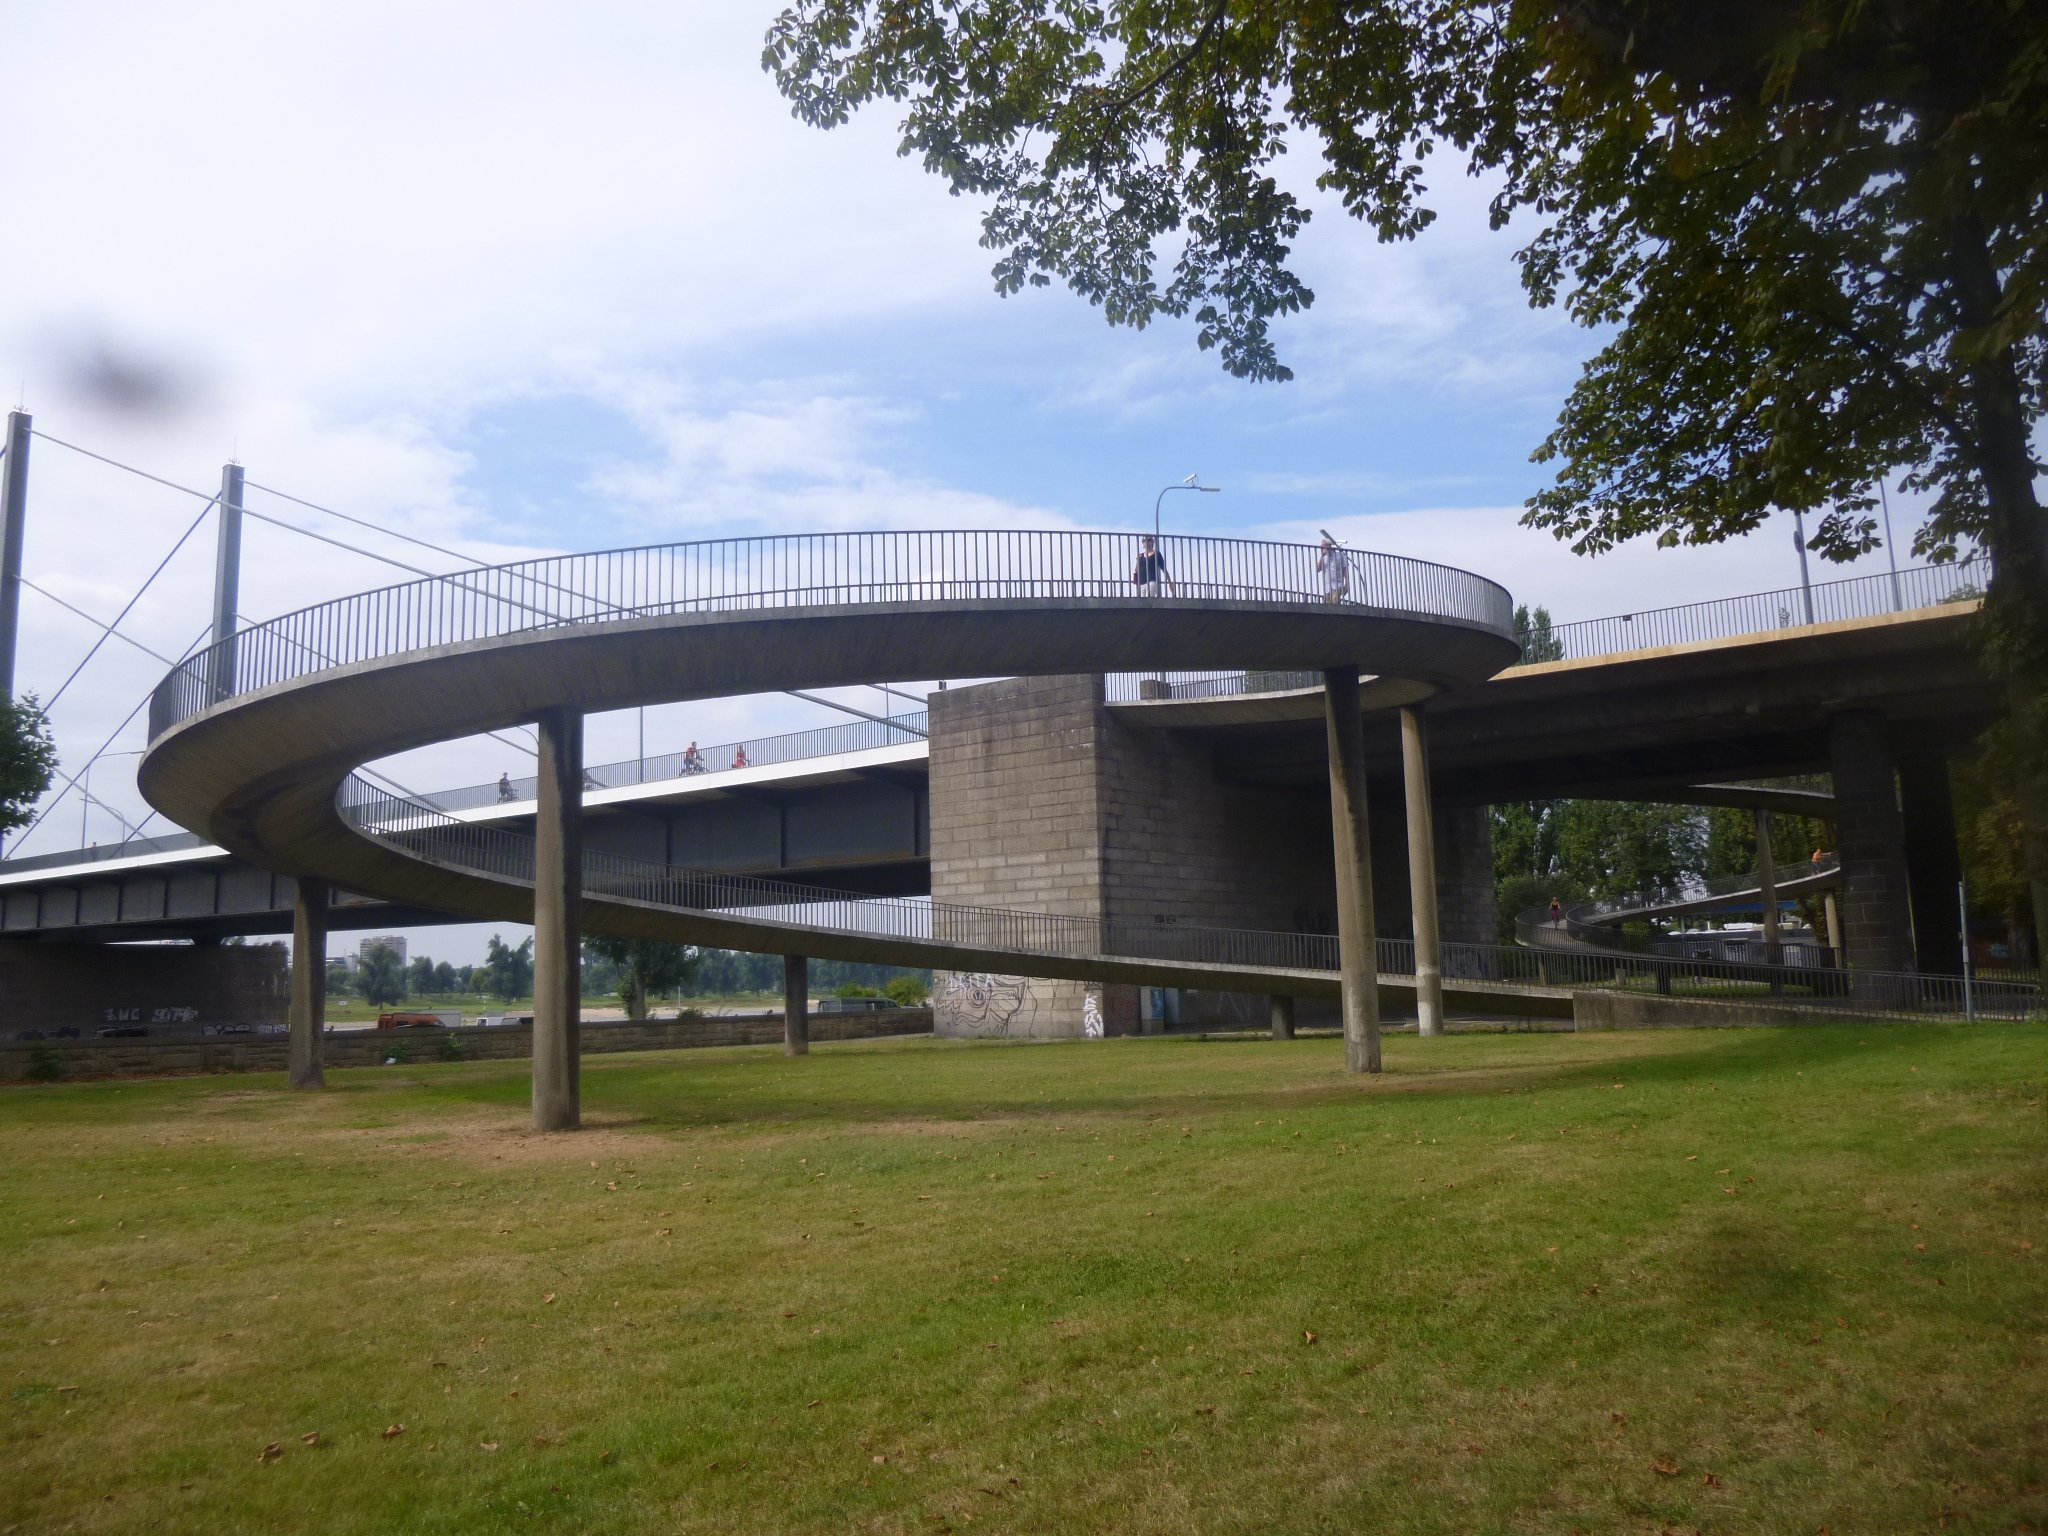 Theodor-Heuss-Brücke - Aufgang